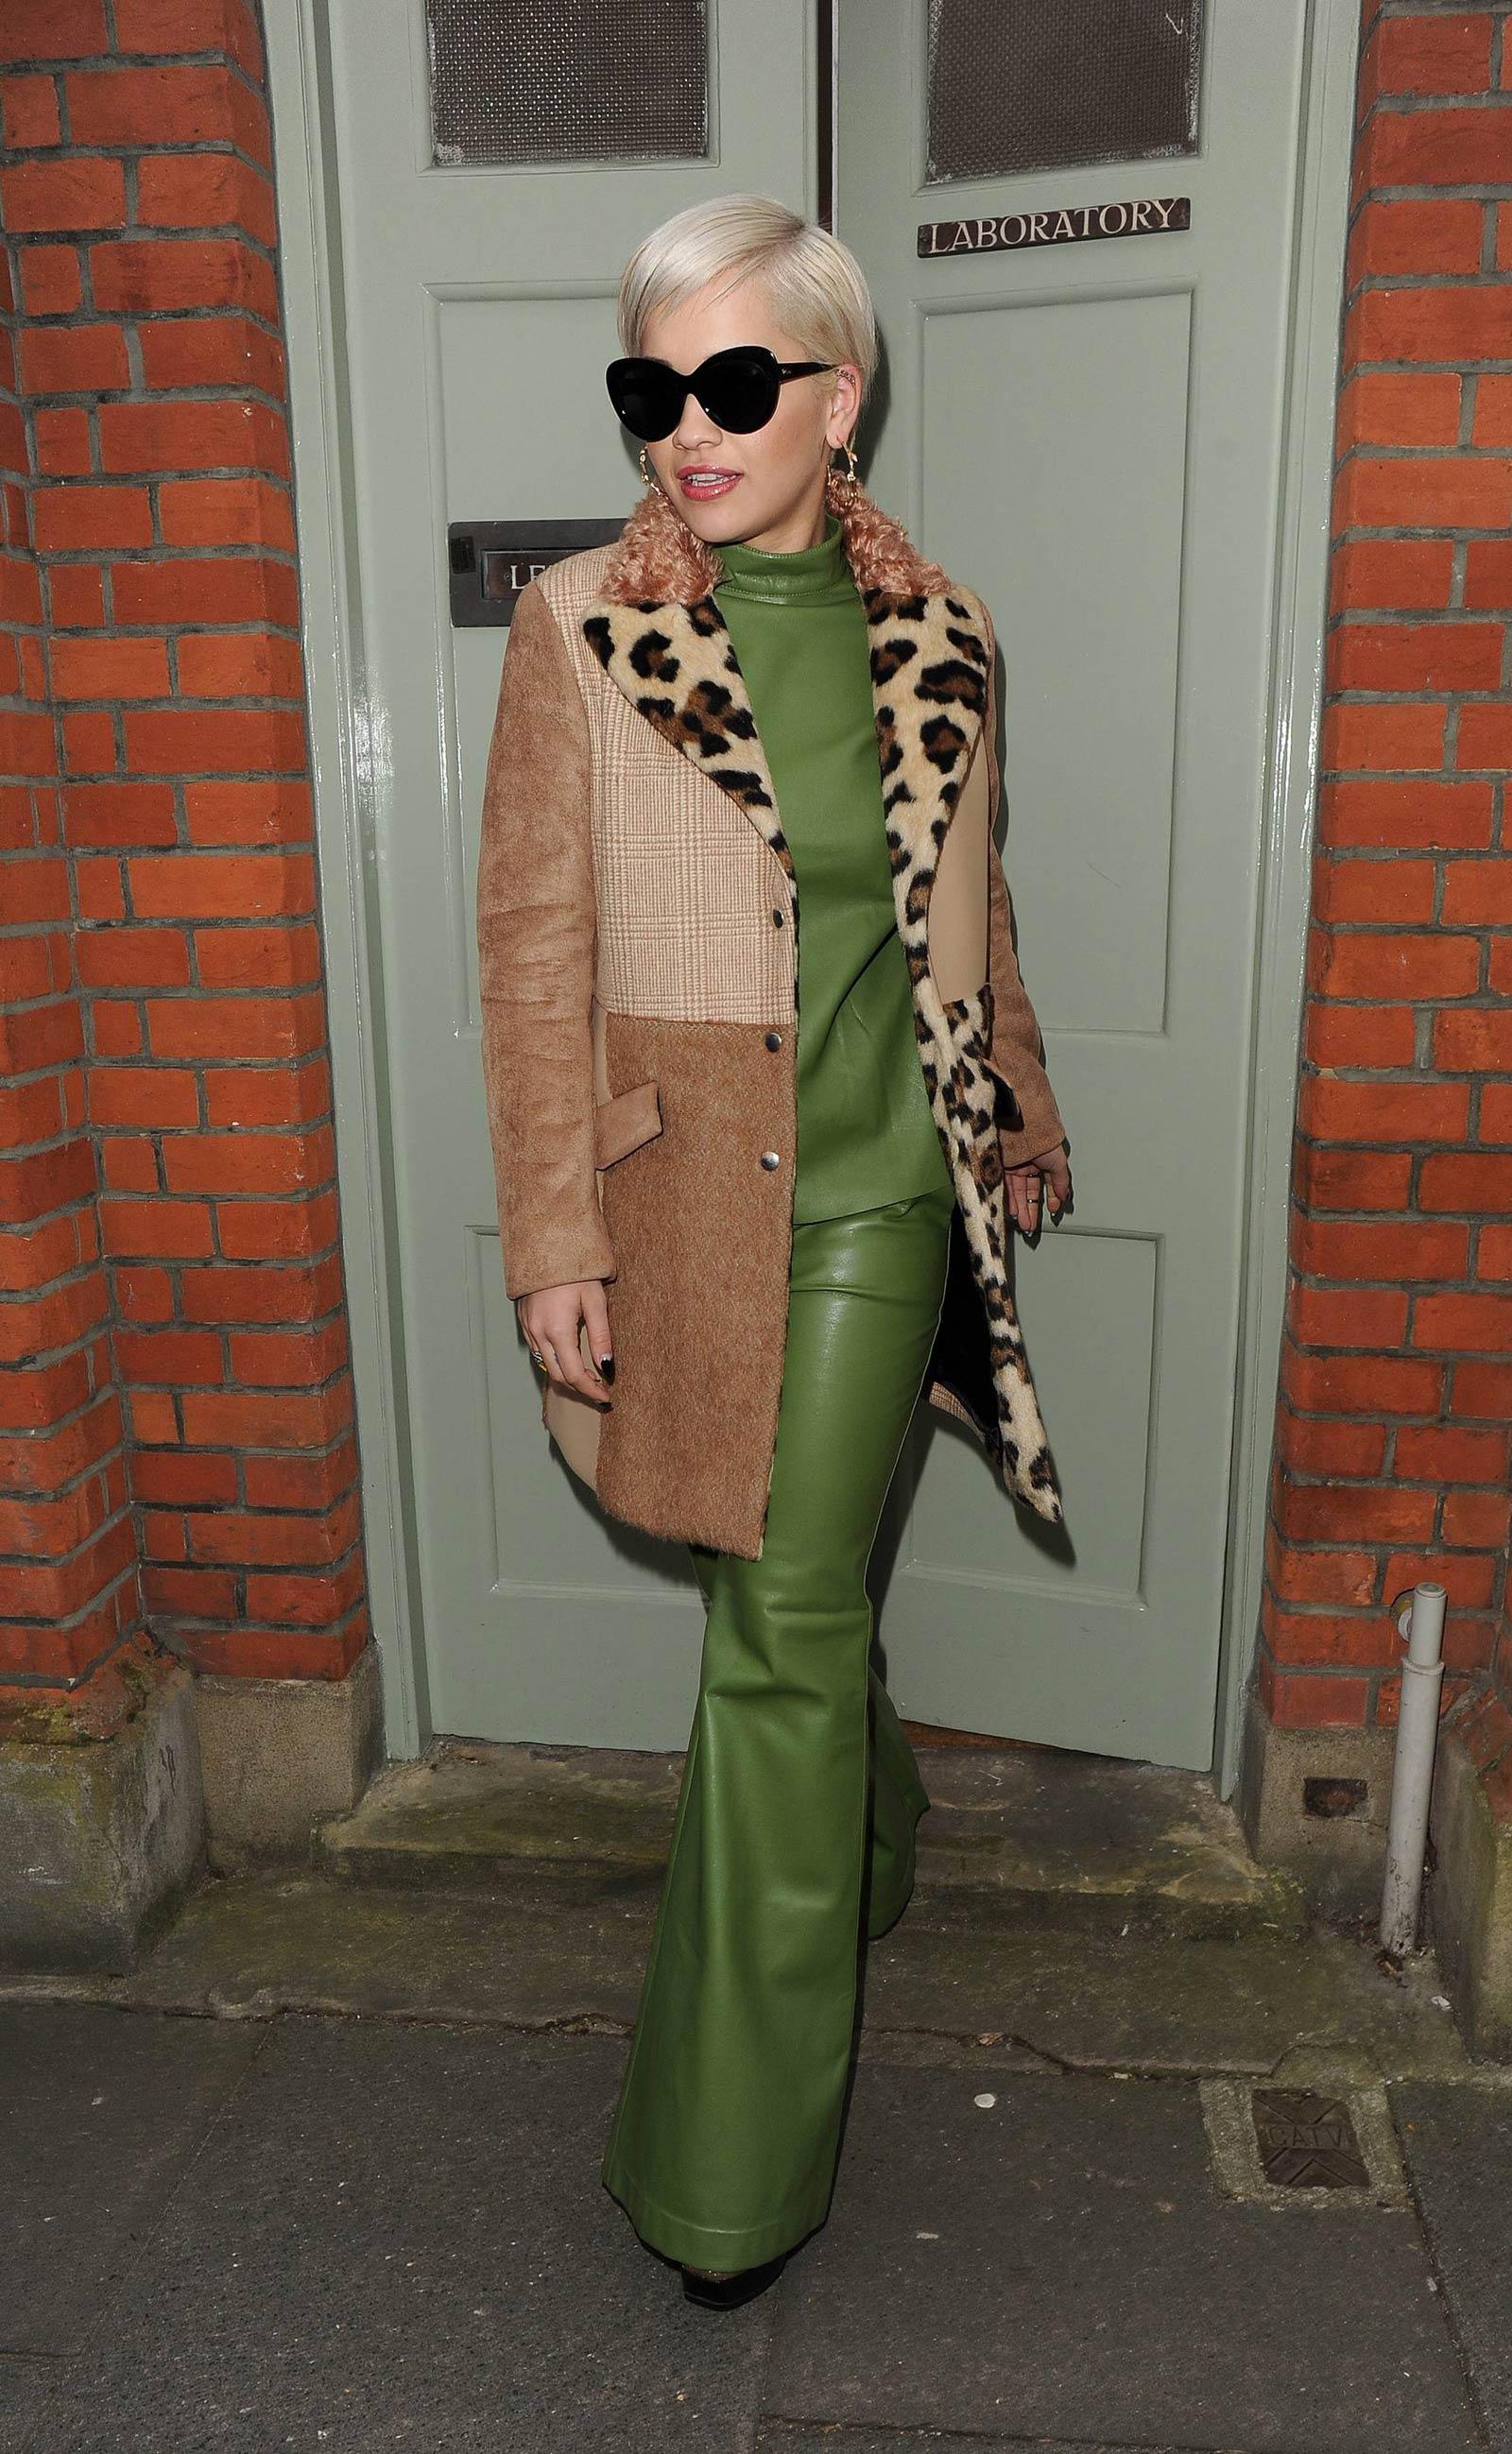 Rita Ora leaving a studio in London